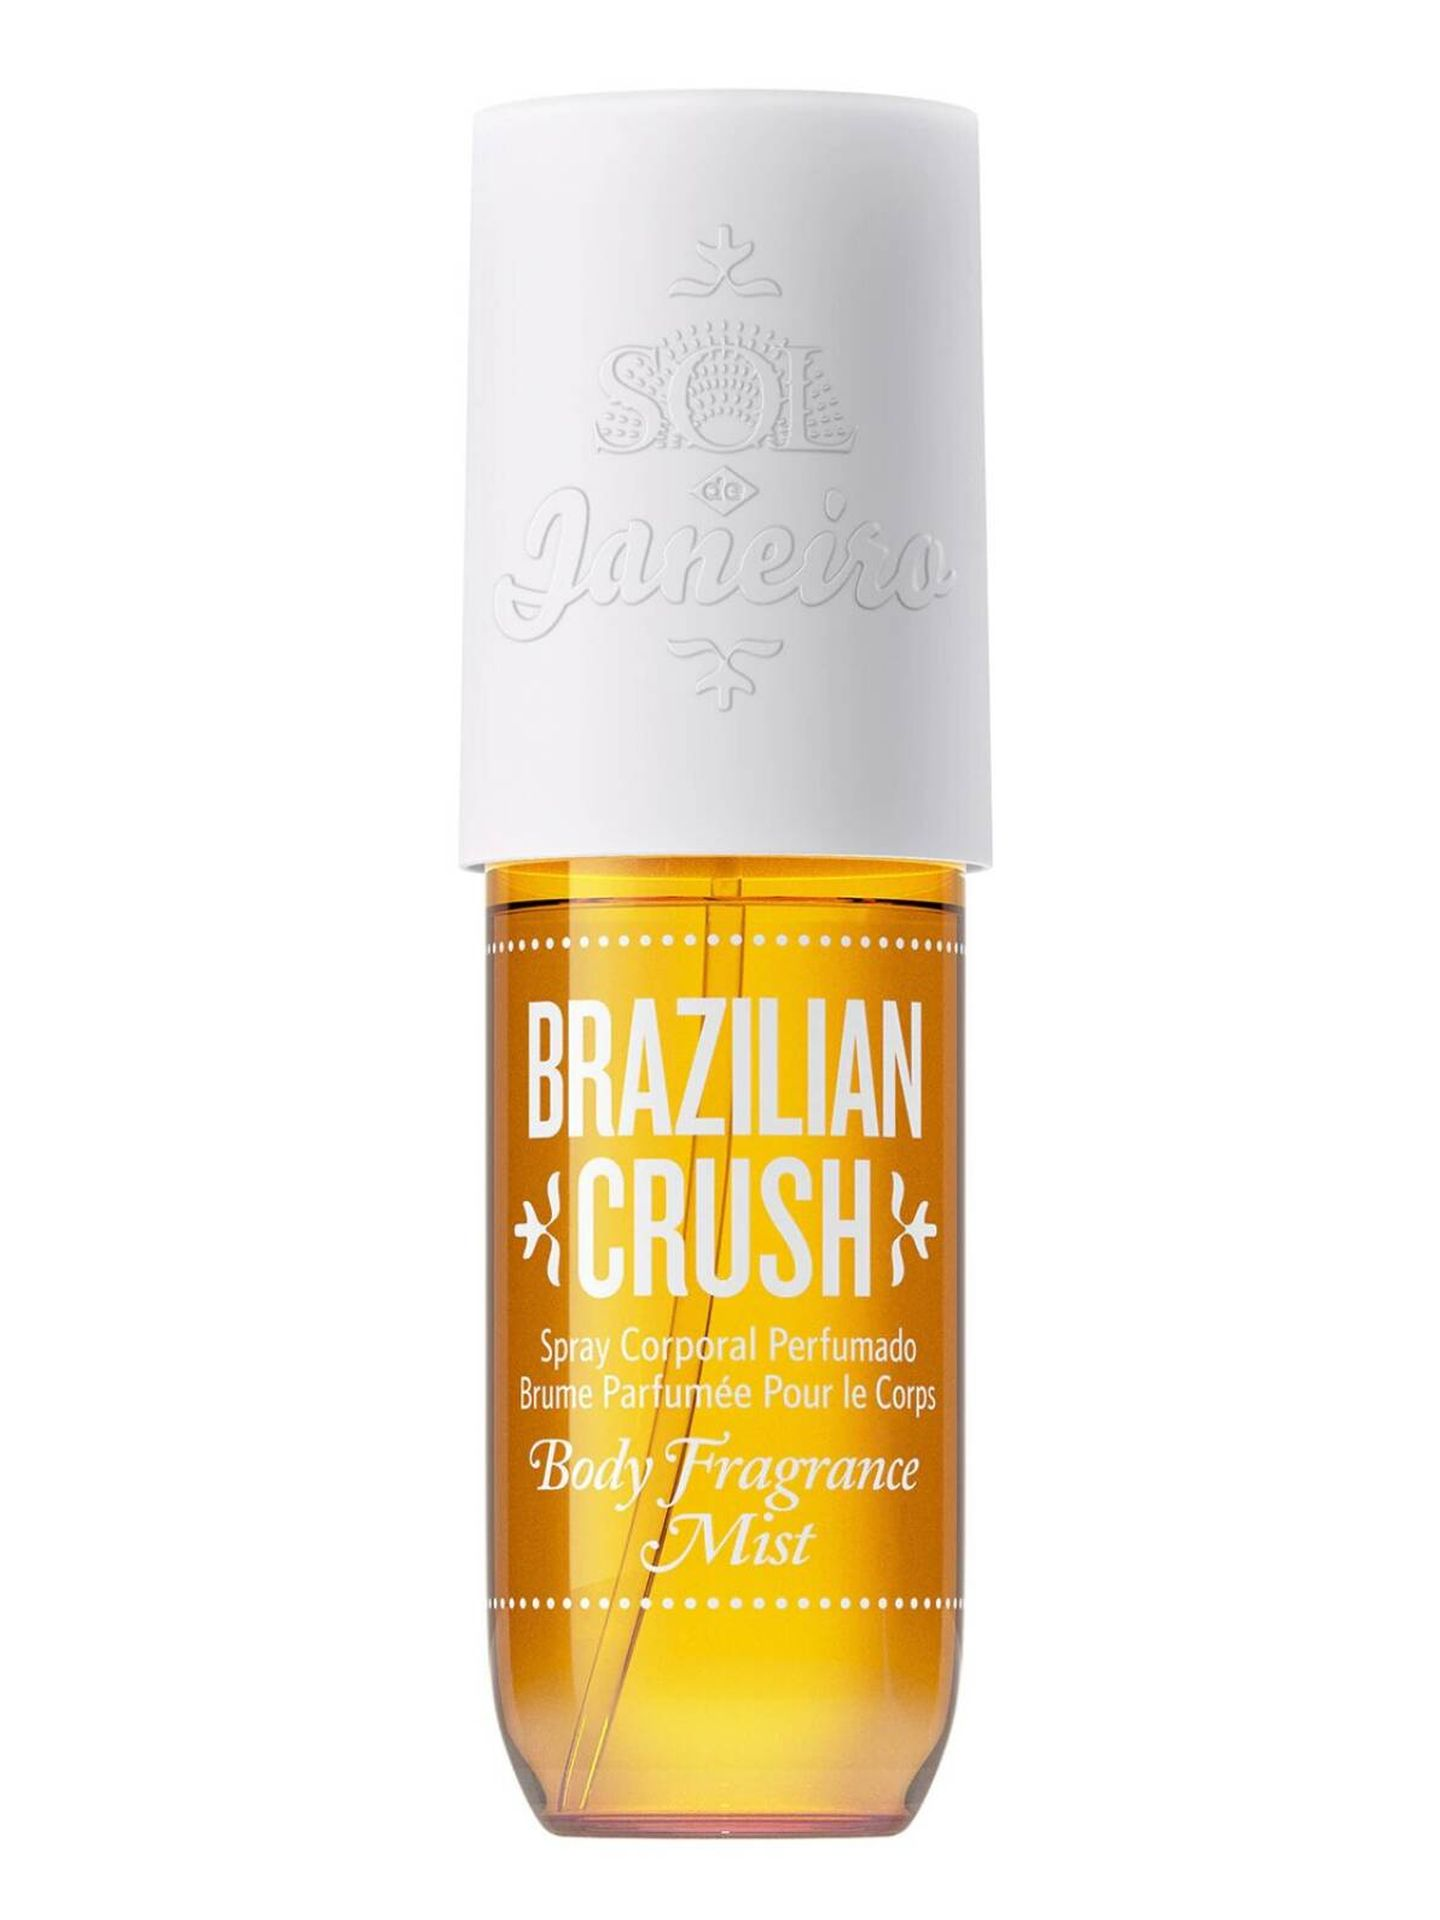 Brazilian Crush Body Fragrance Mist, de Sol de Janeiro.